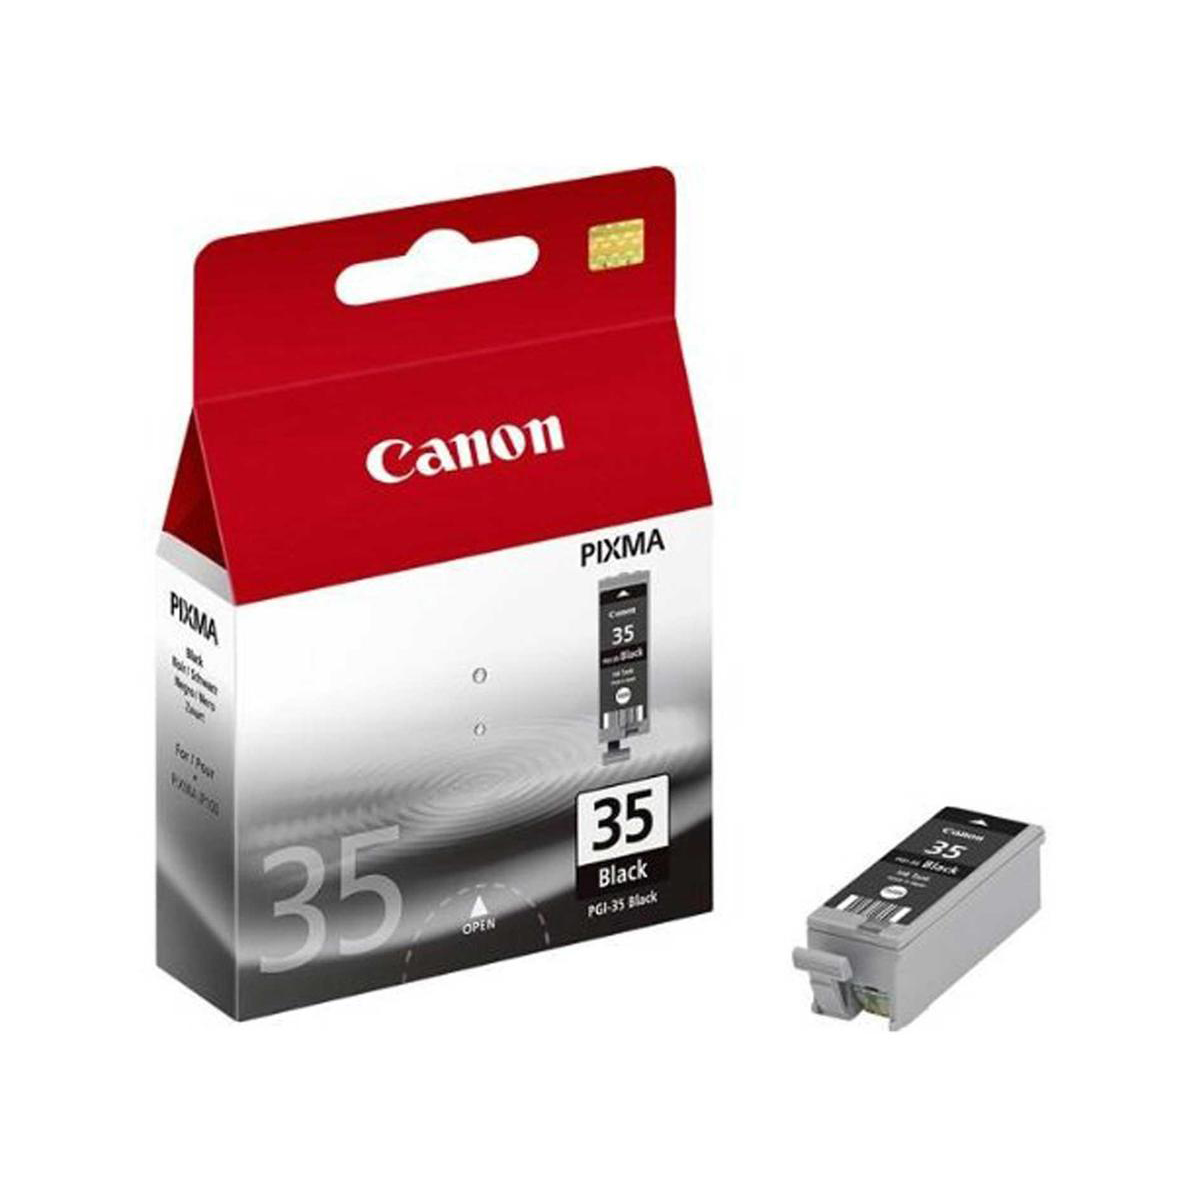 Canon PGI-35 Inkjet Cartridge Page Life 191pp 9.3ml Black Ref 1509B001